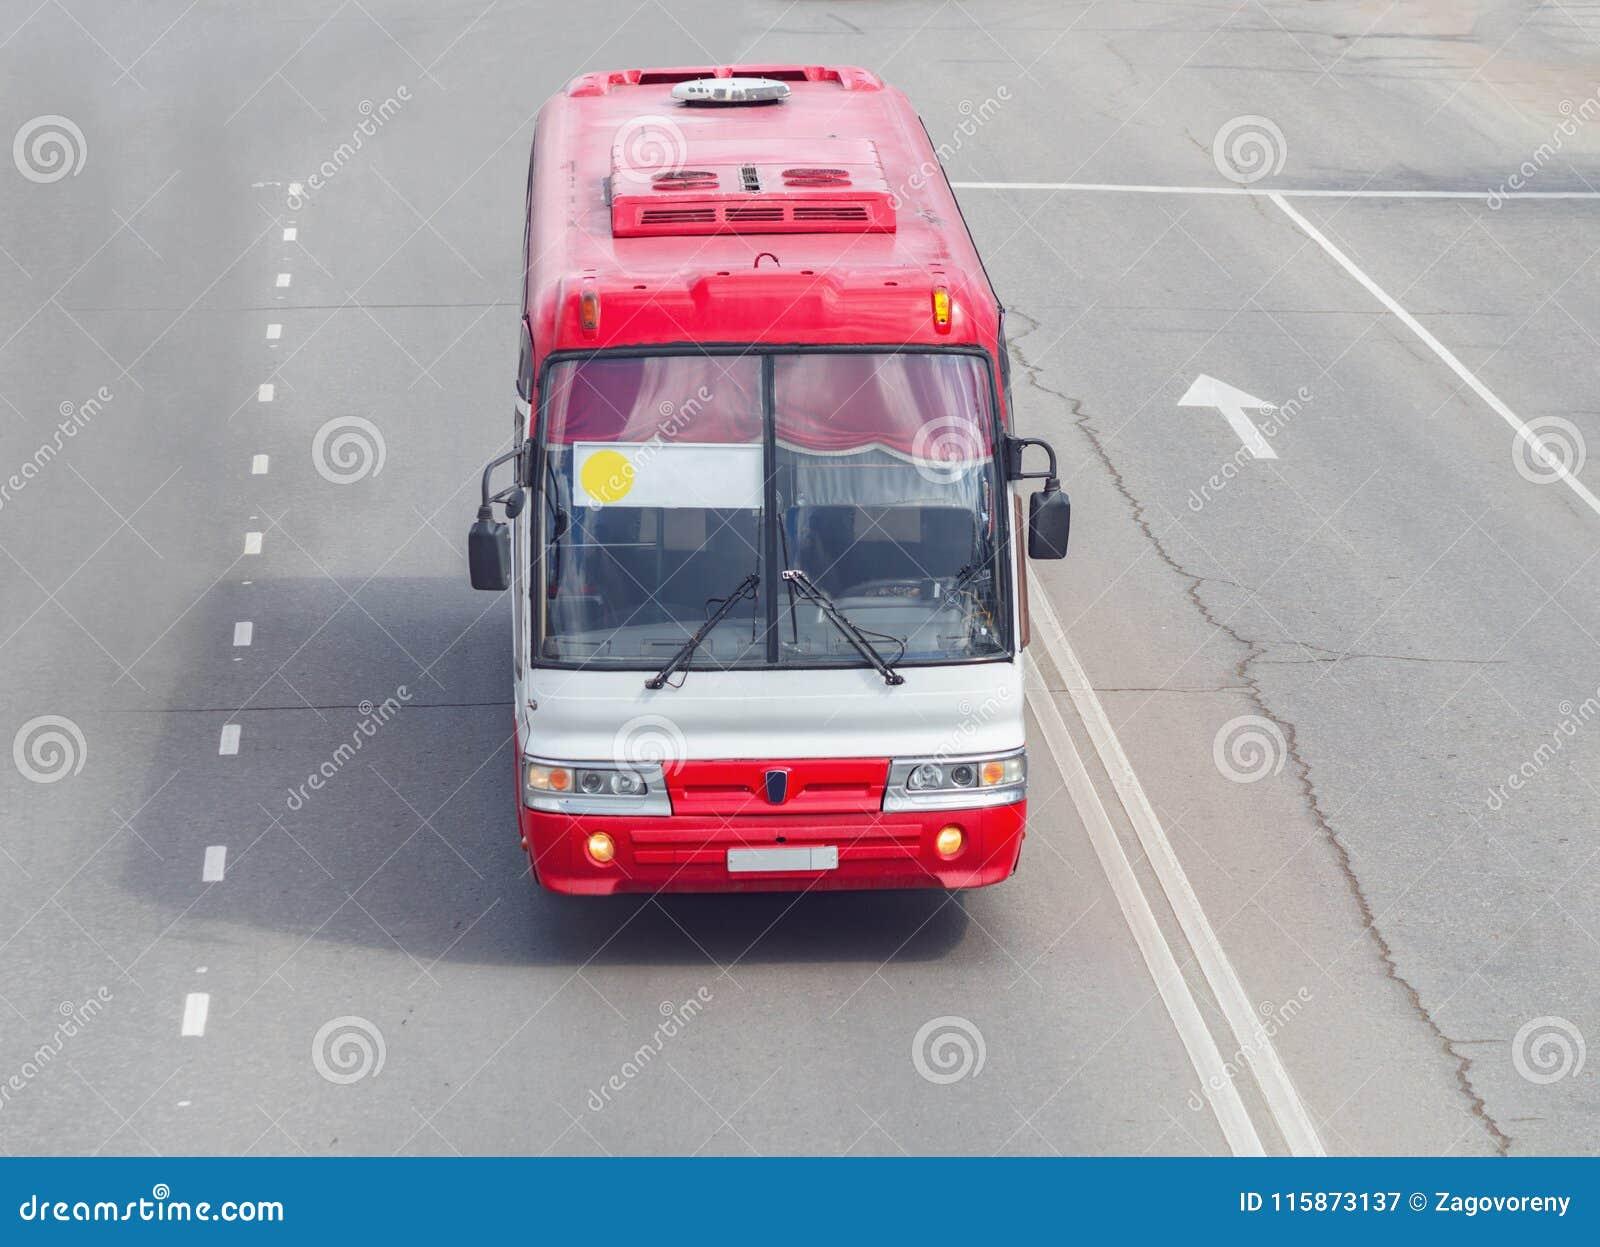 Een rode buslooppas langs de weg